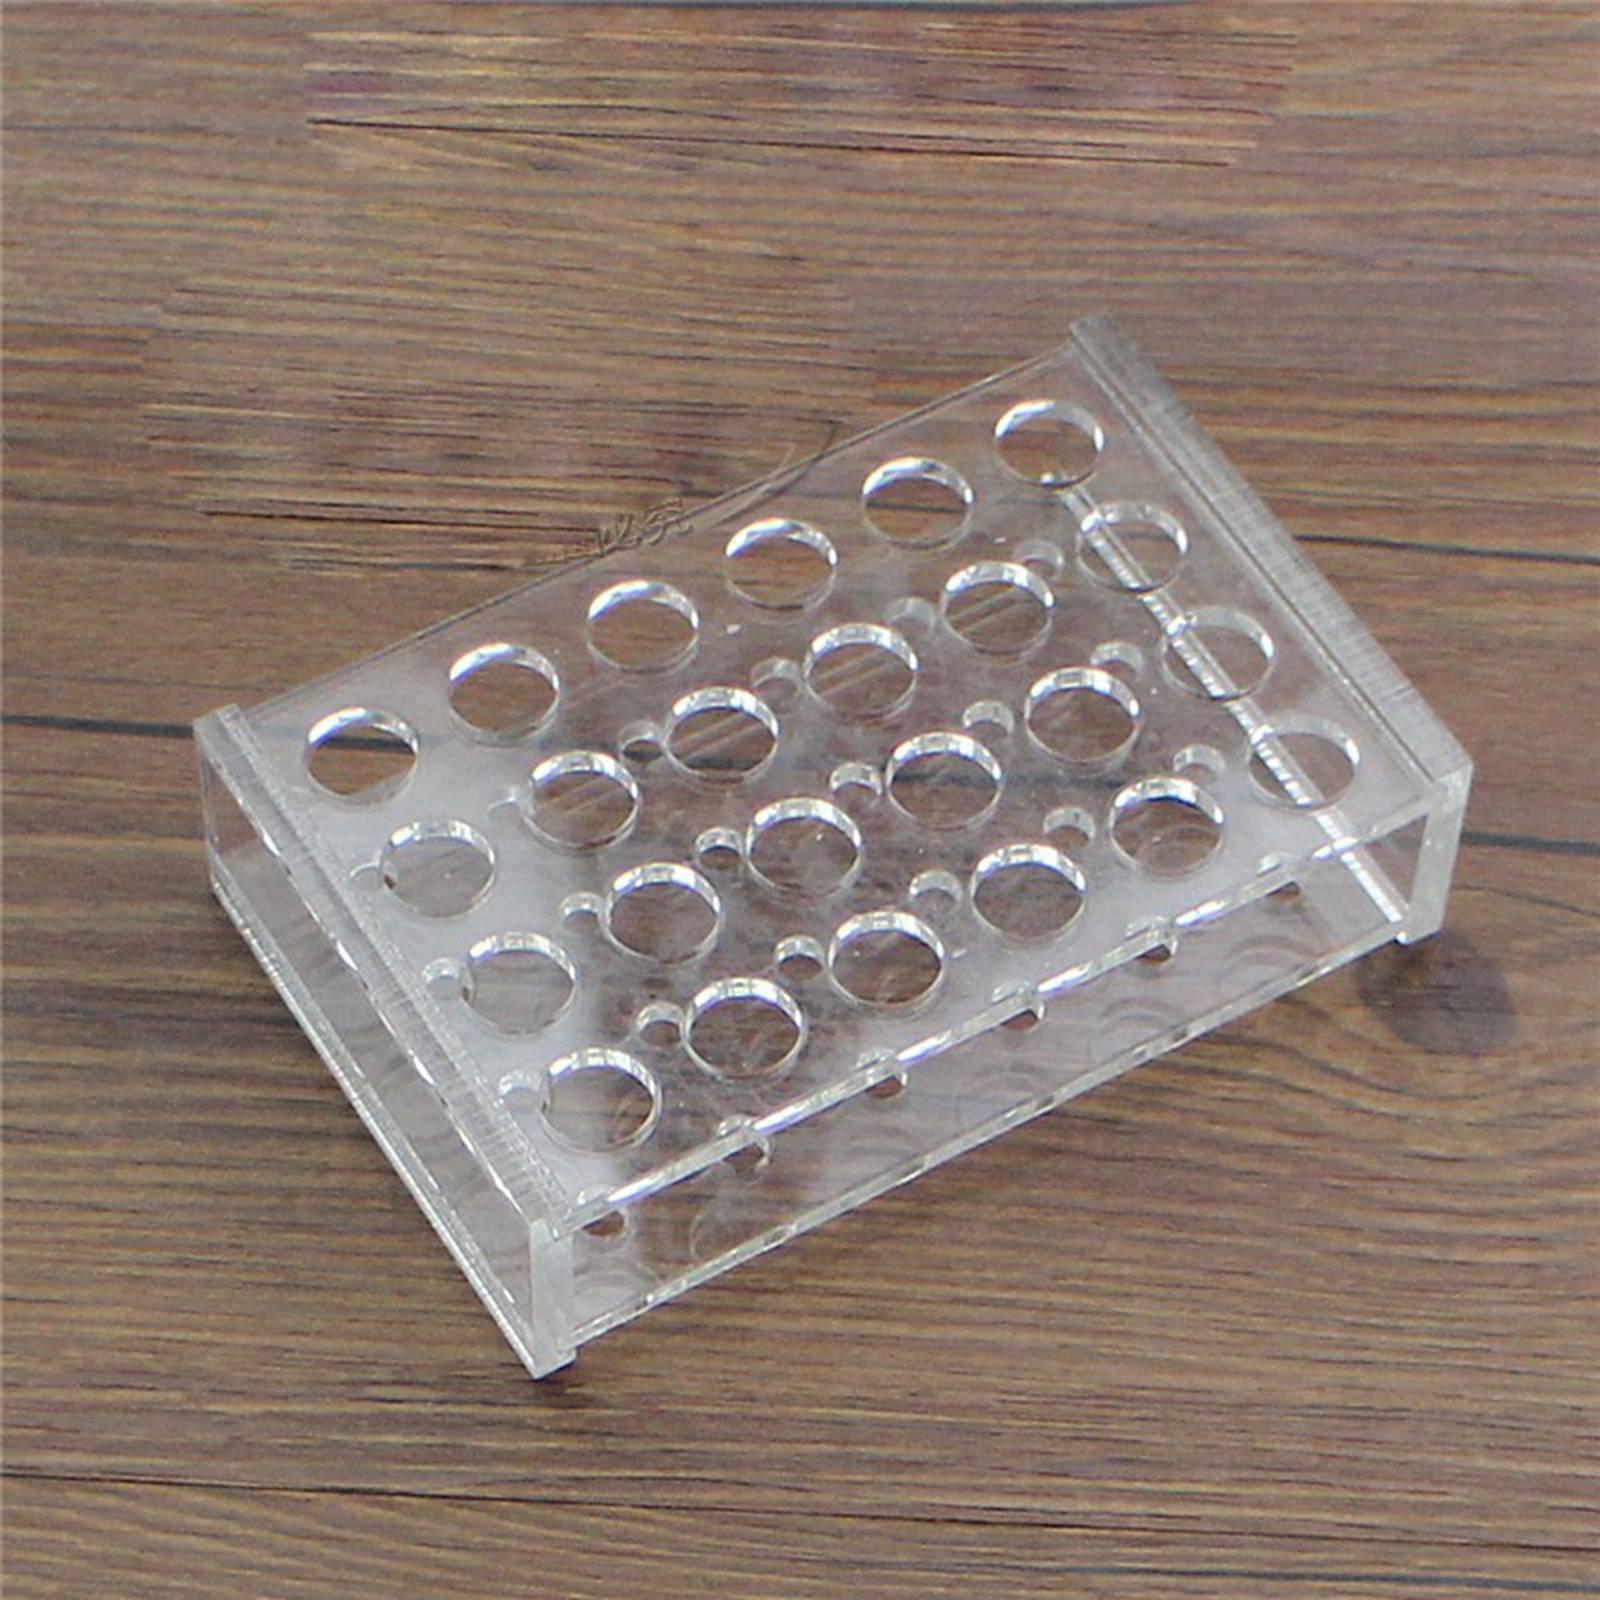 17mm Diam 24 Holes Methyl Methacrylate Rack Stand For 10/15ml Centrifuge Tubes